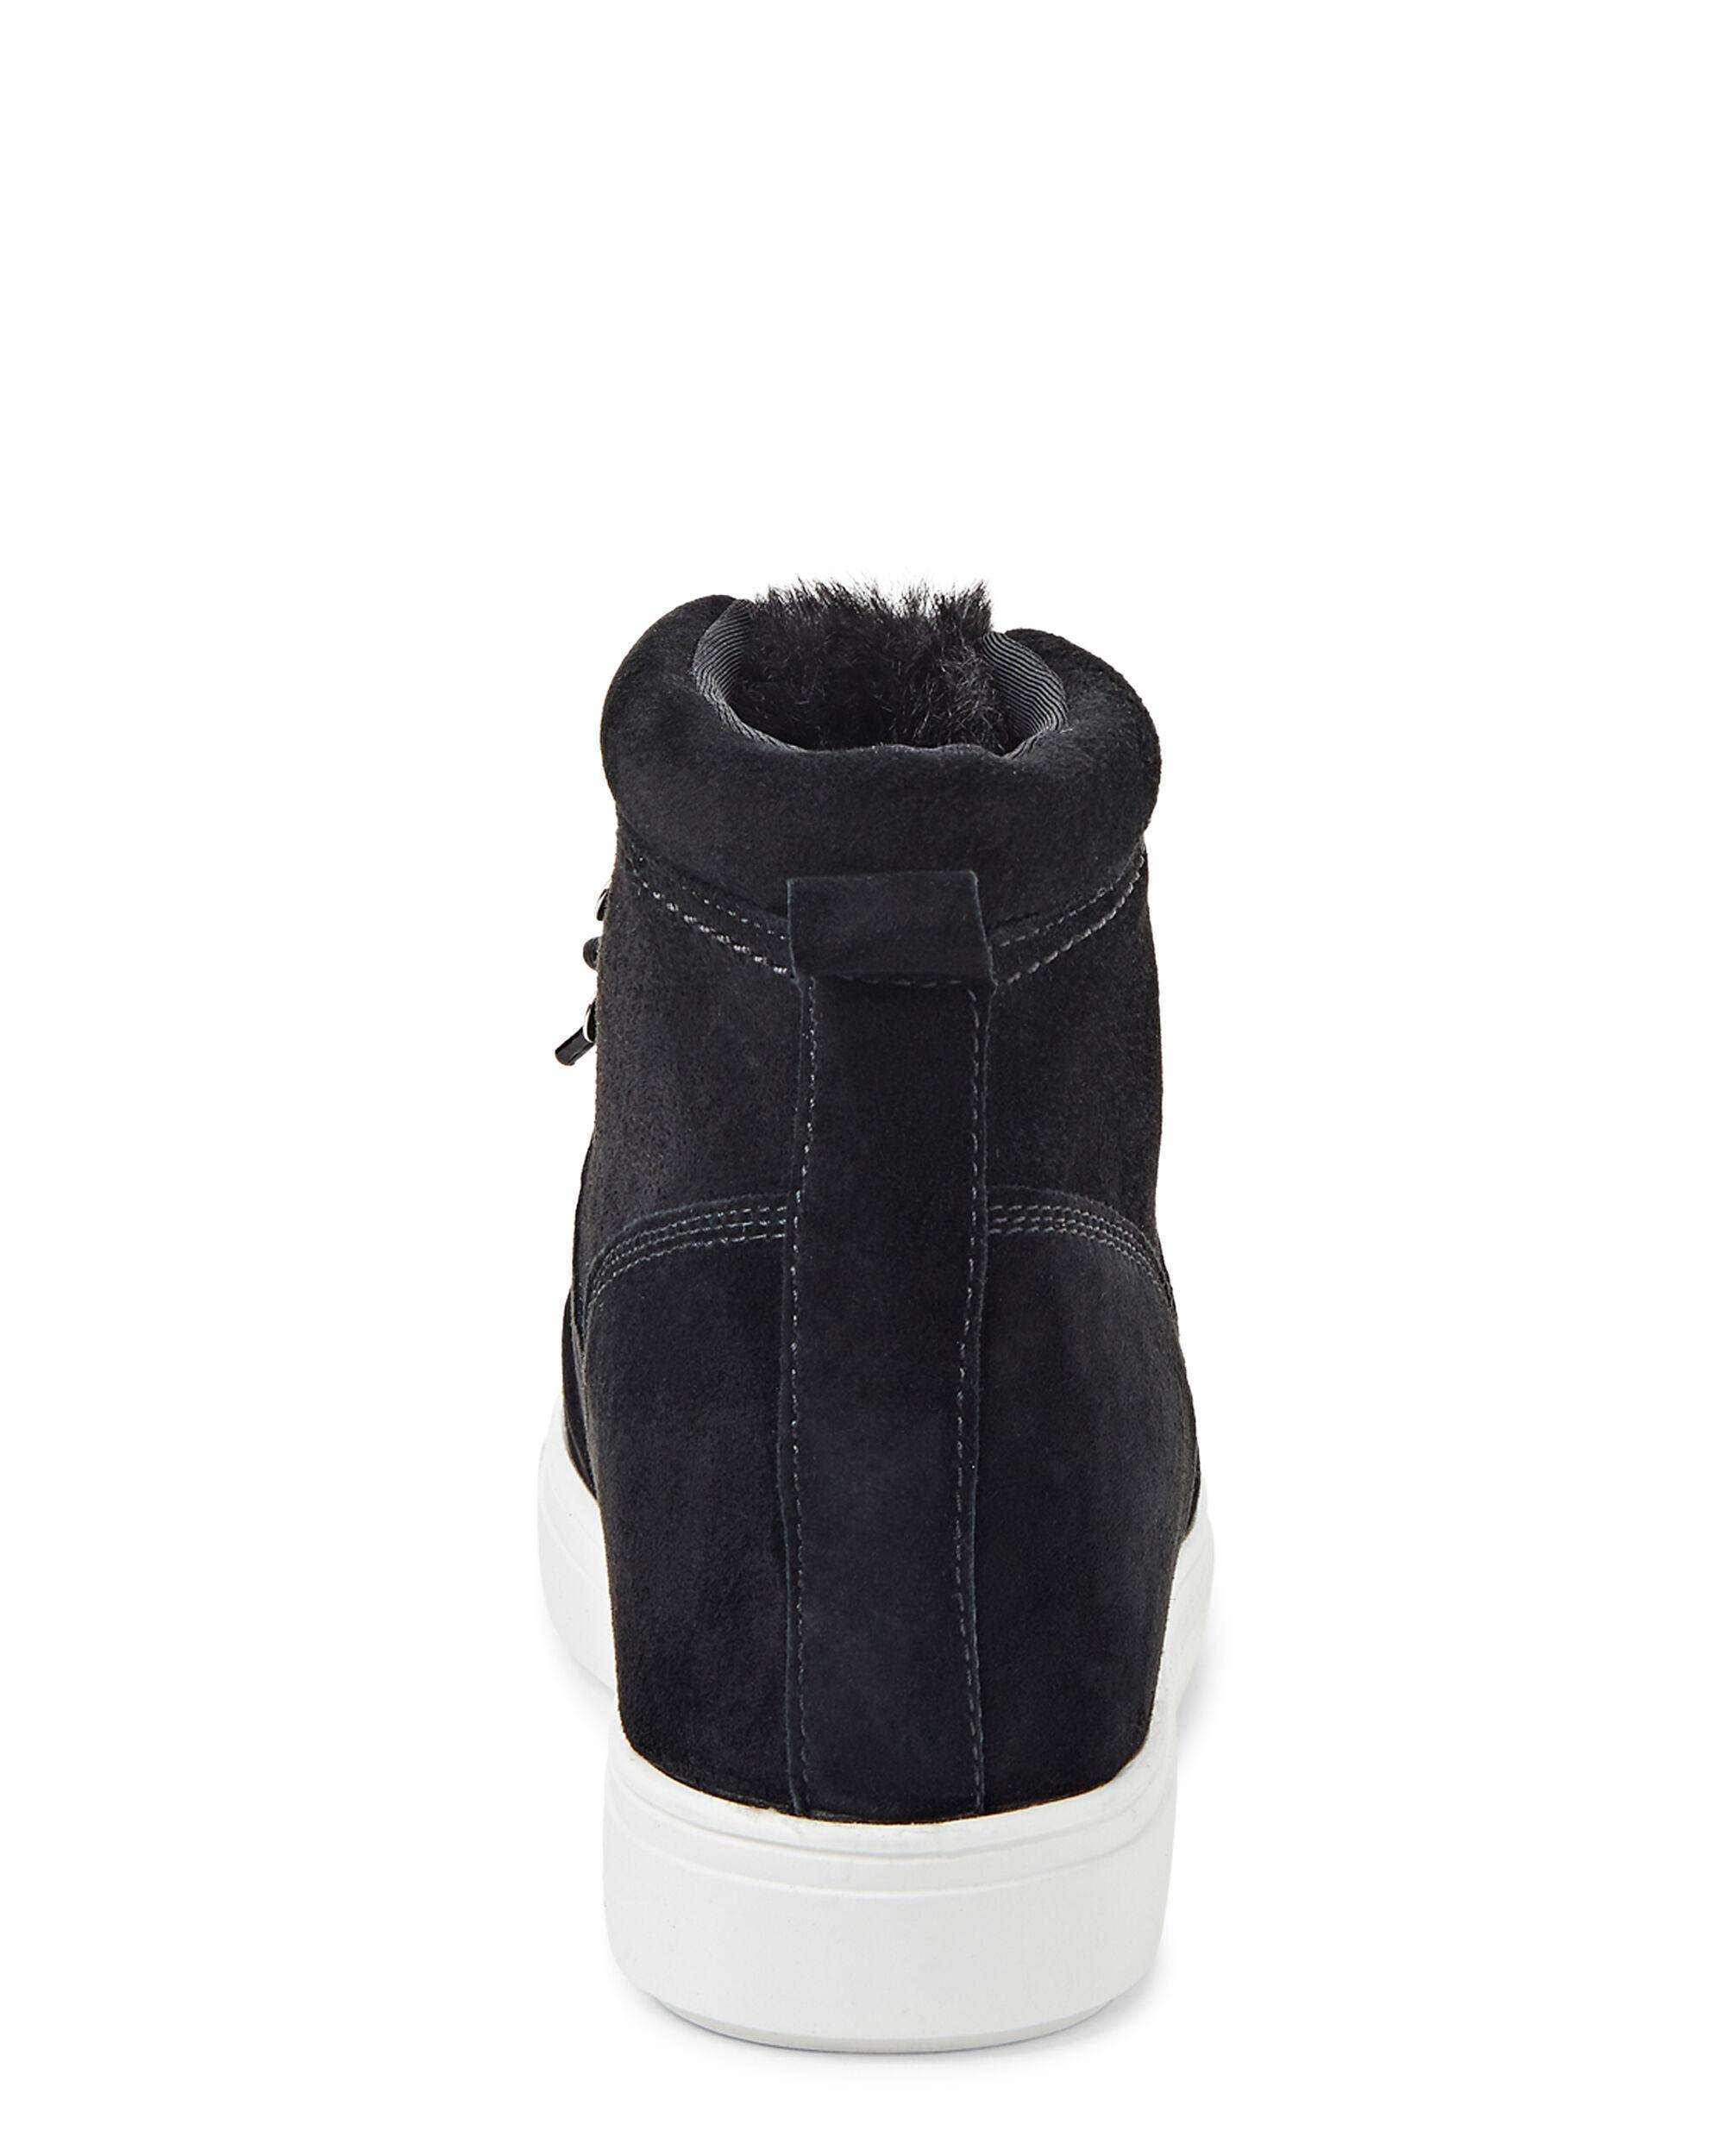 cdb05fe6113 Women's Black Kalea Suede Wedge Sneakers